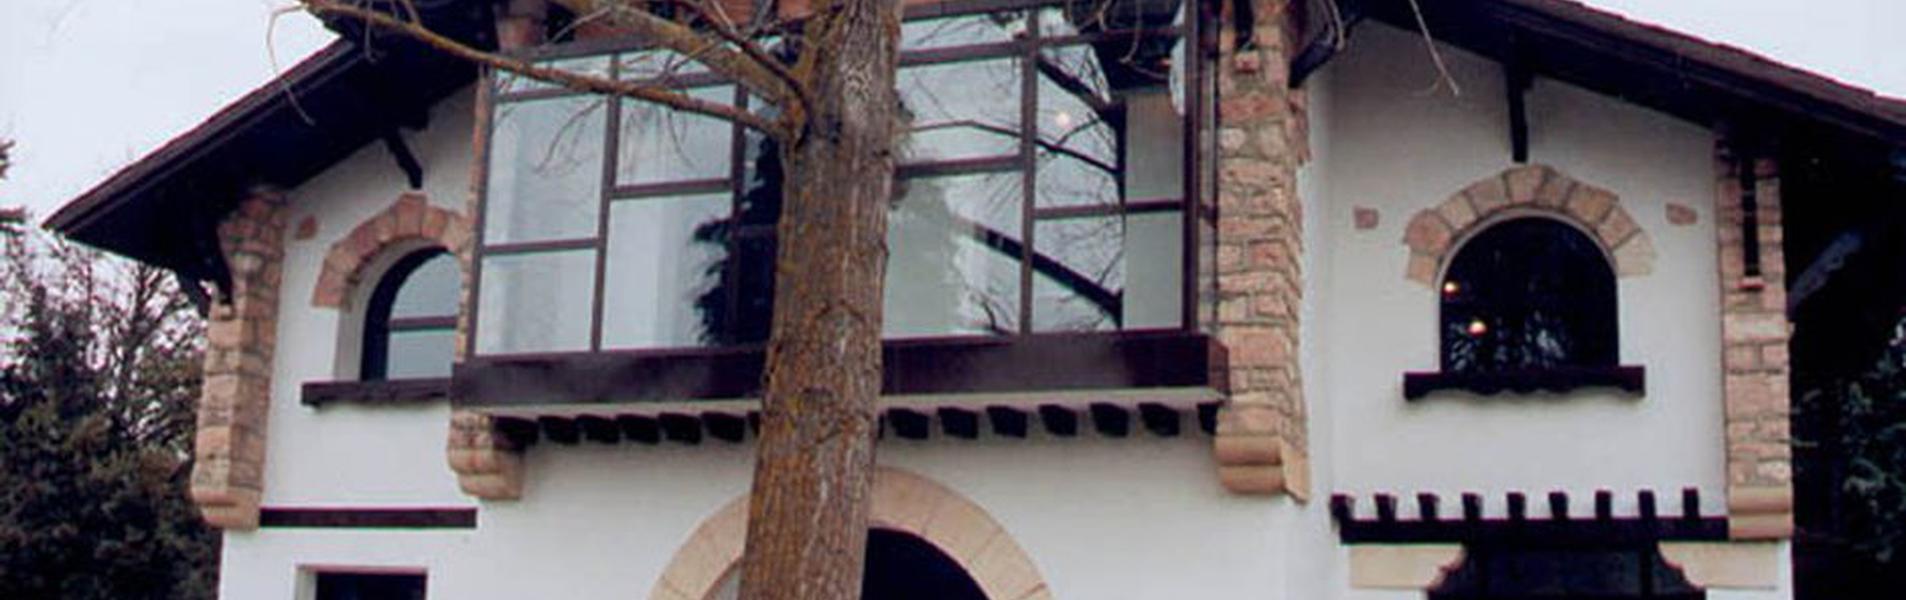 Museo La Casa del Ingeniero